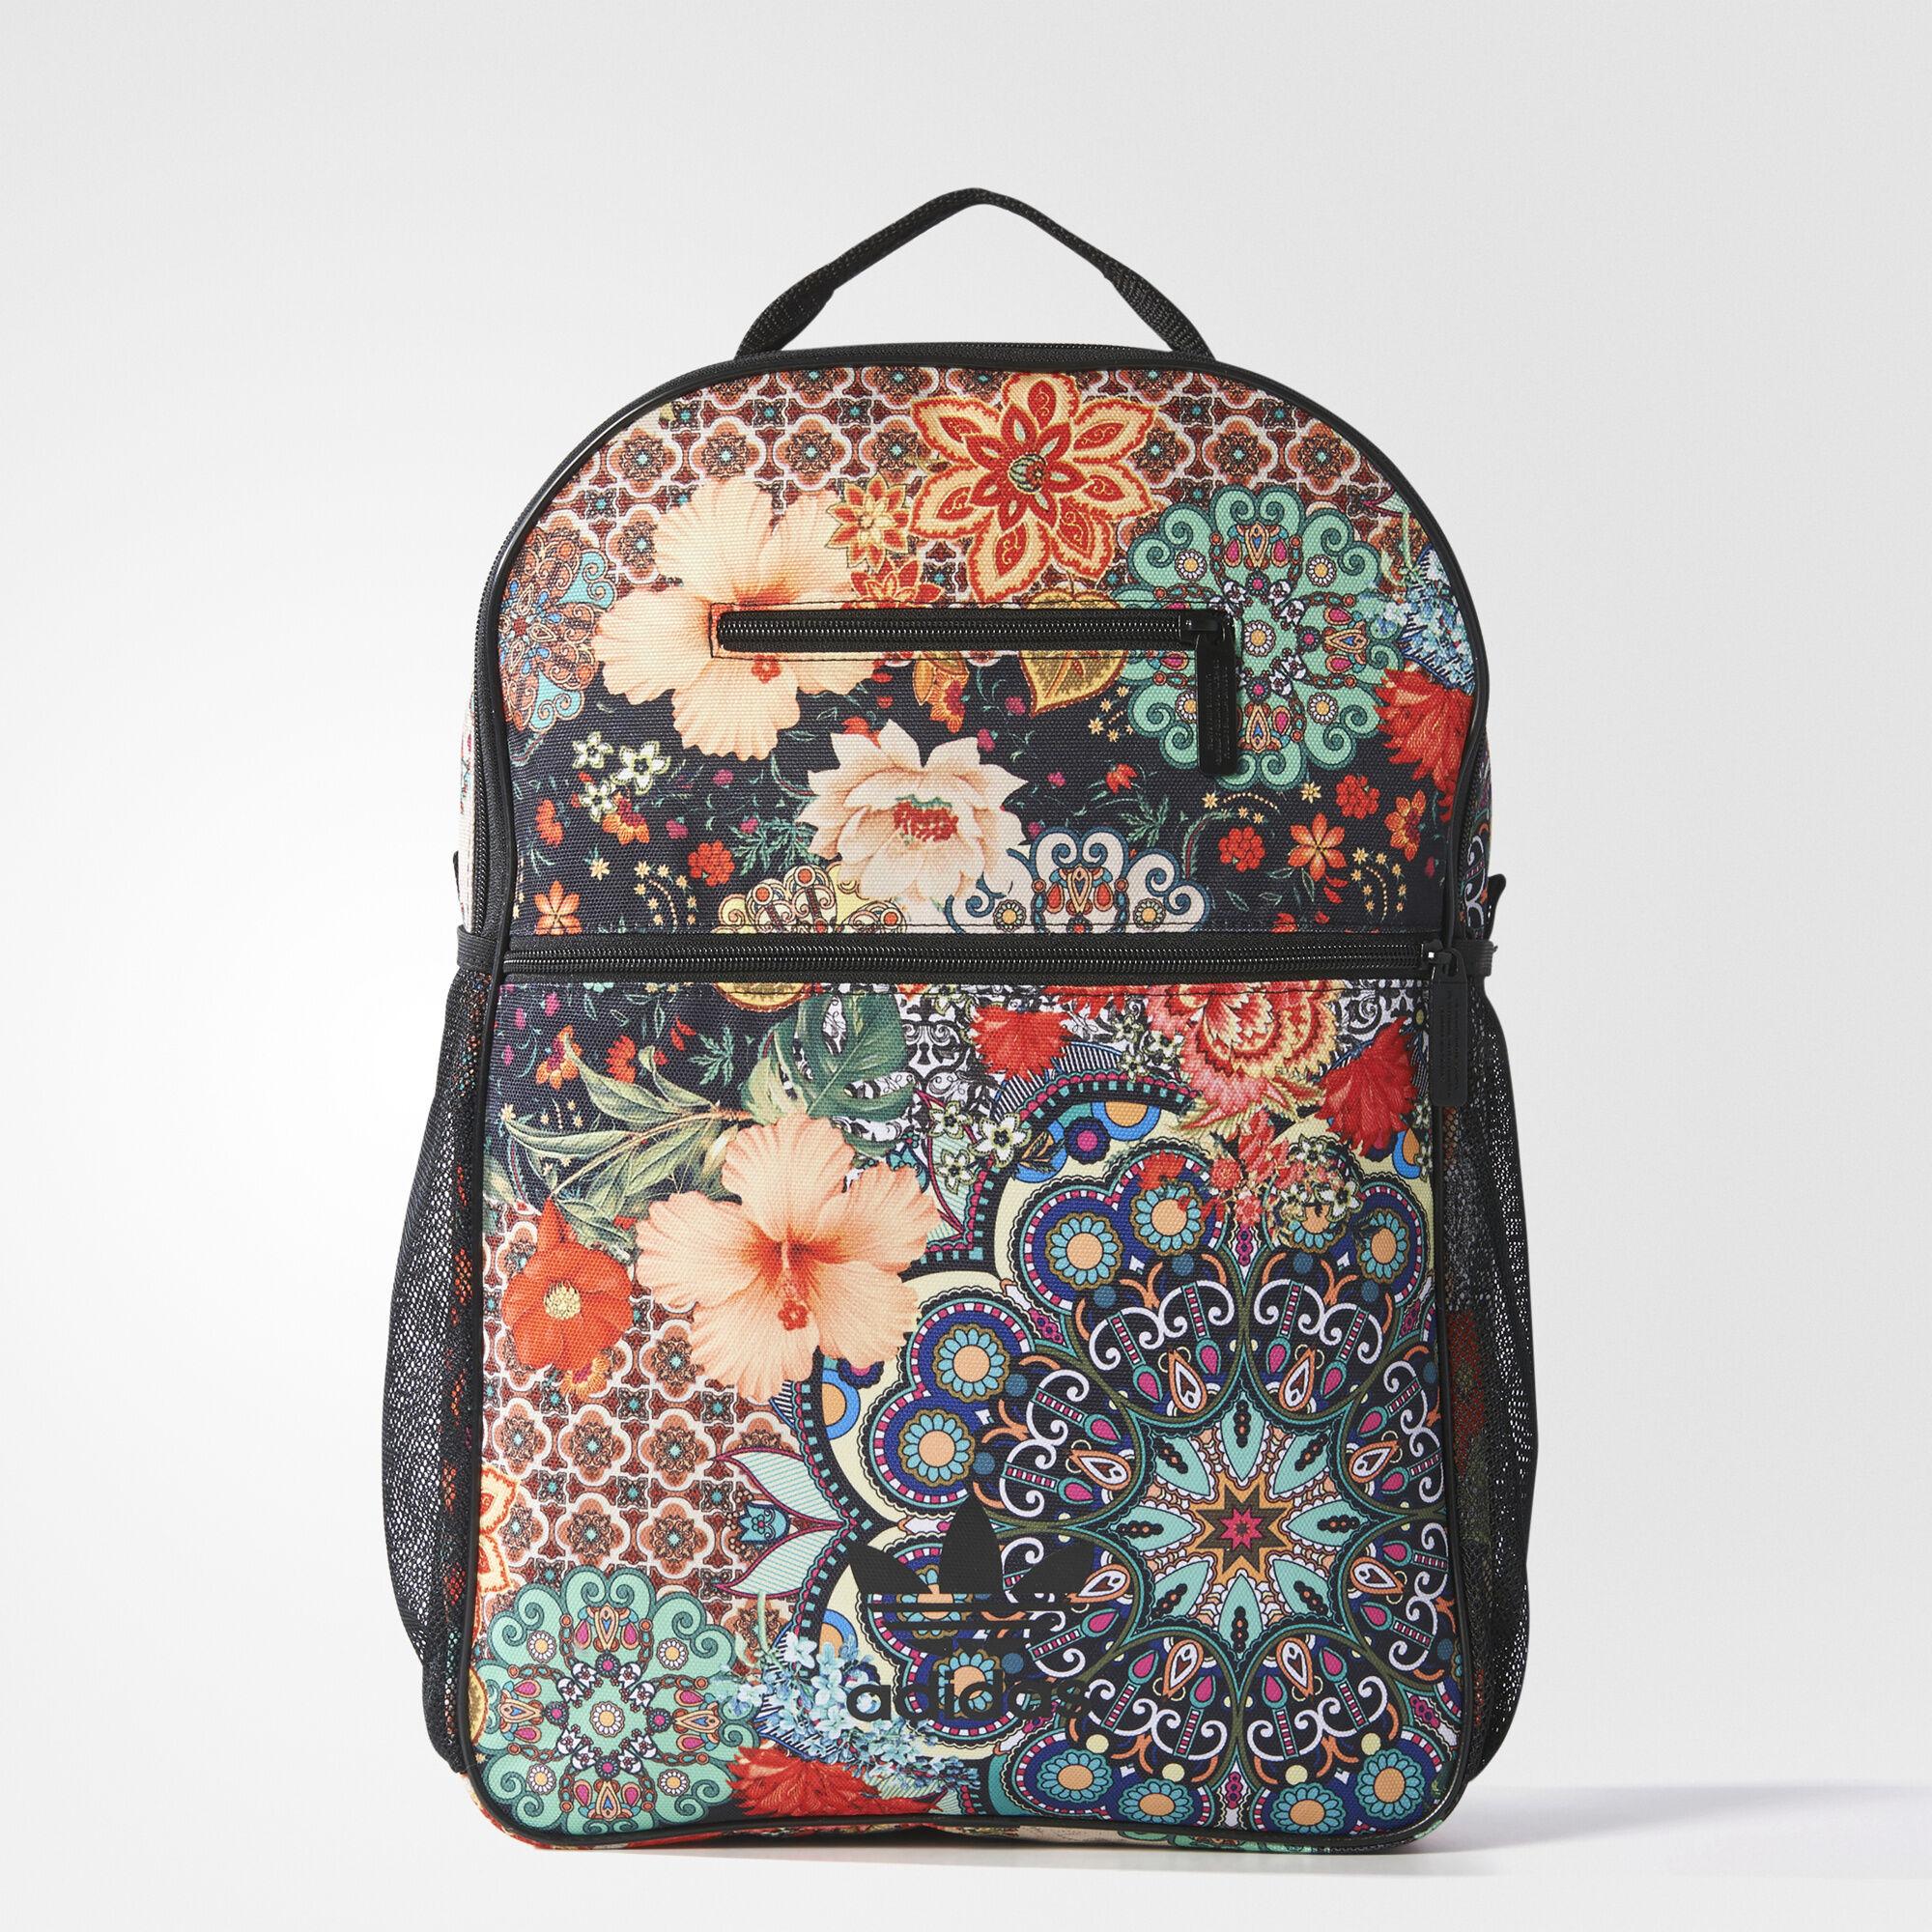 21d13e08400c Buy adidas aztec bag   OFF64% Discounted